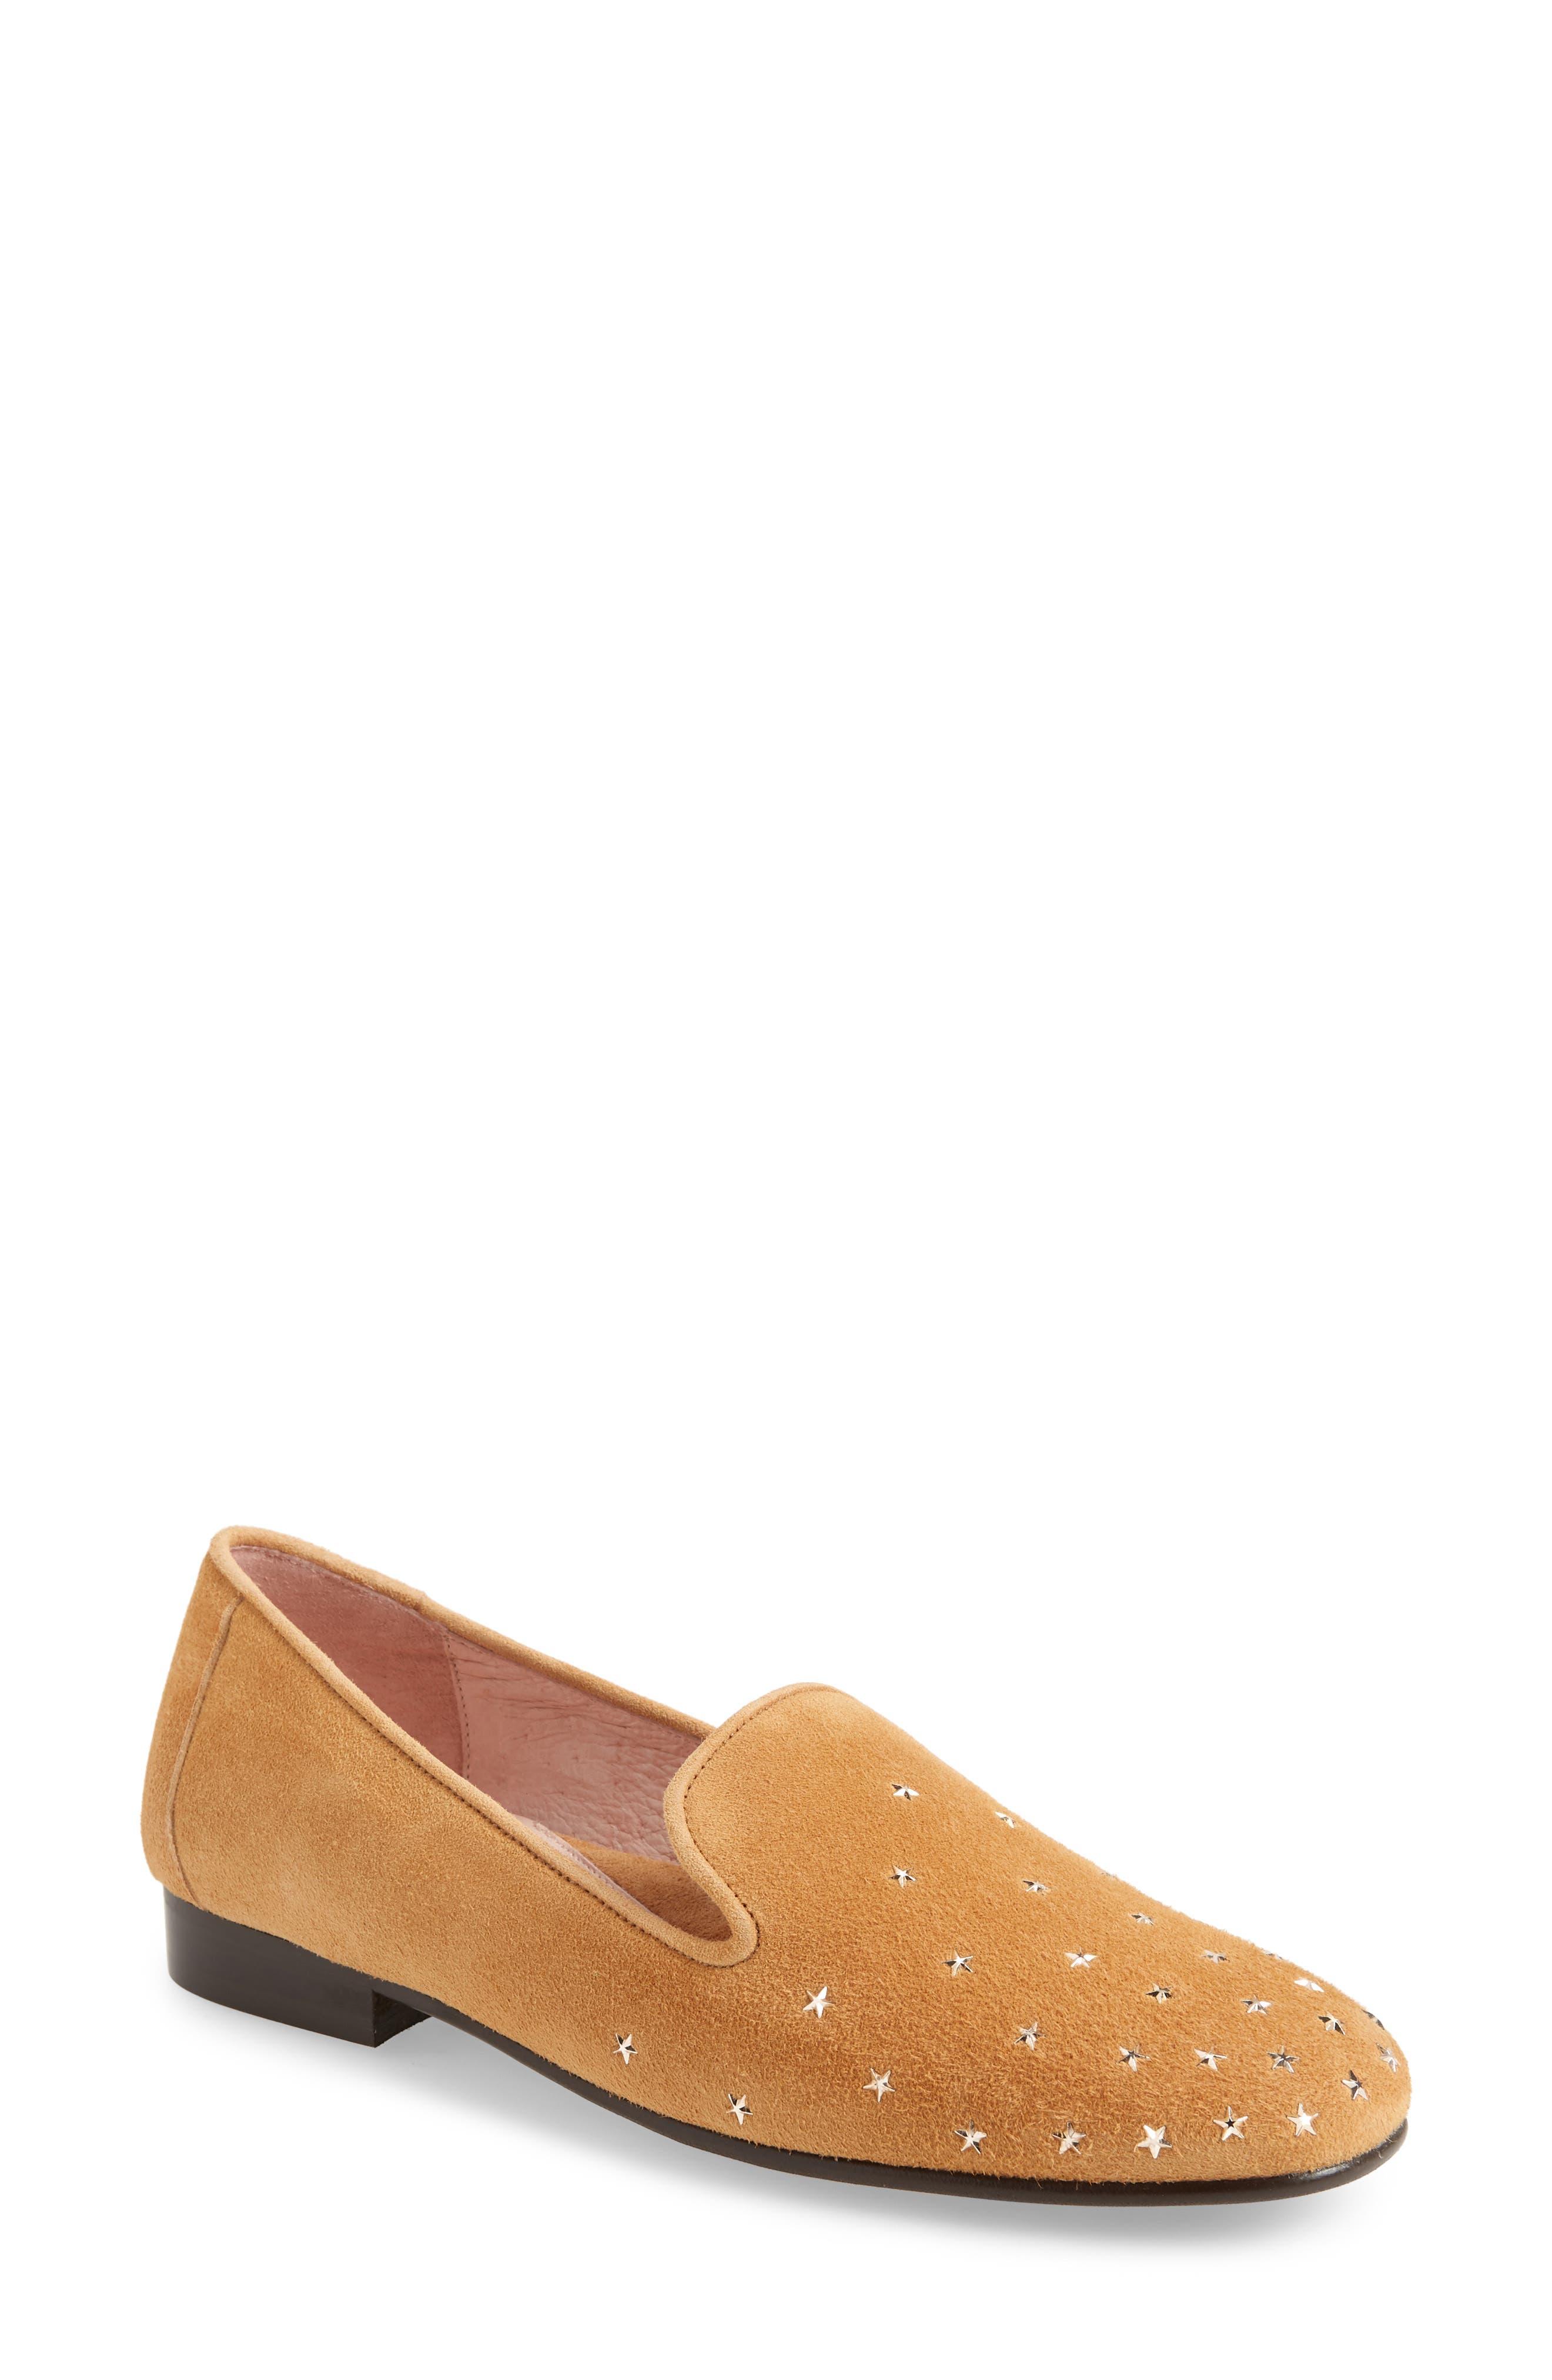 Patricia Green Celeste Star Studded Loafer, Brown